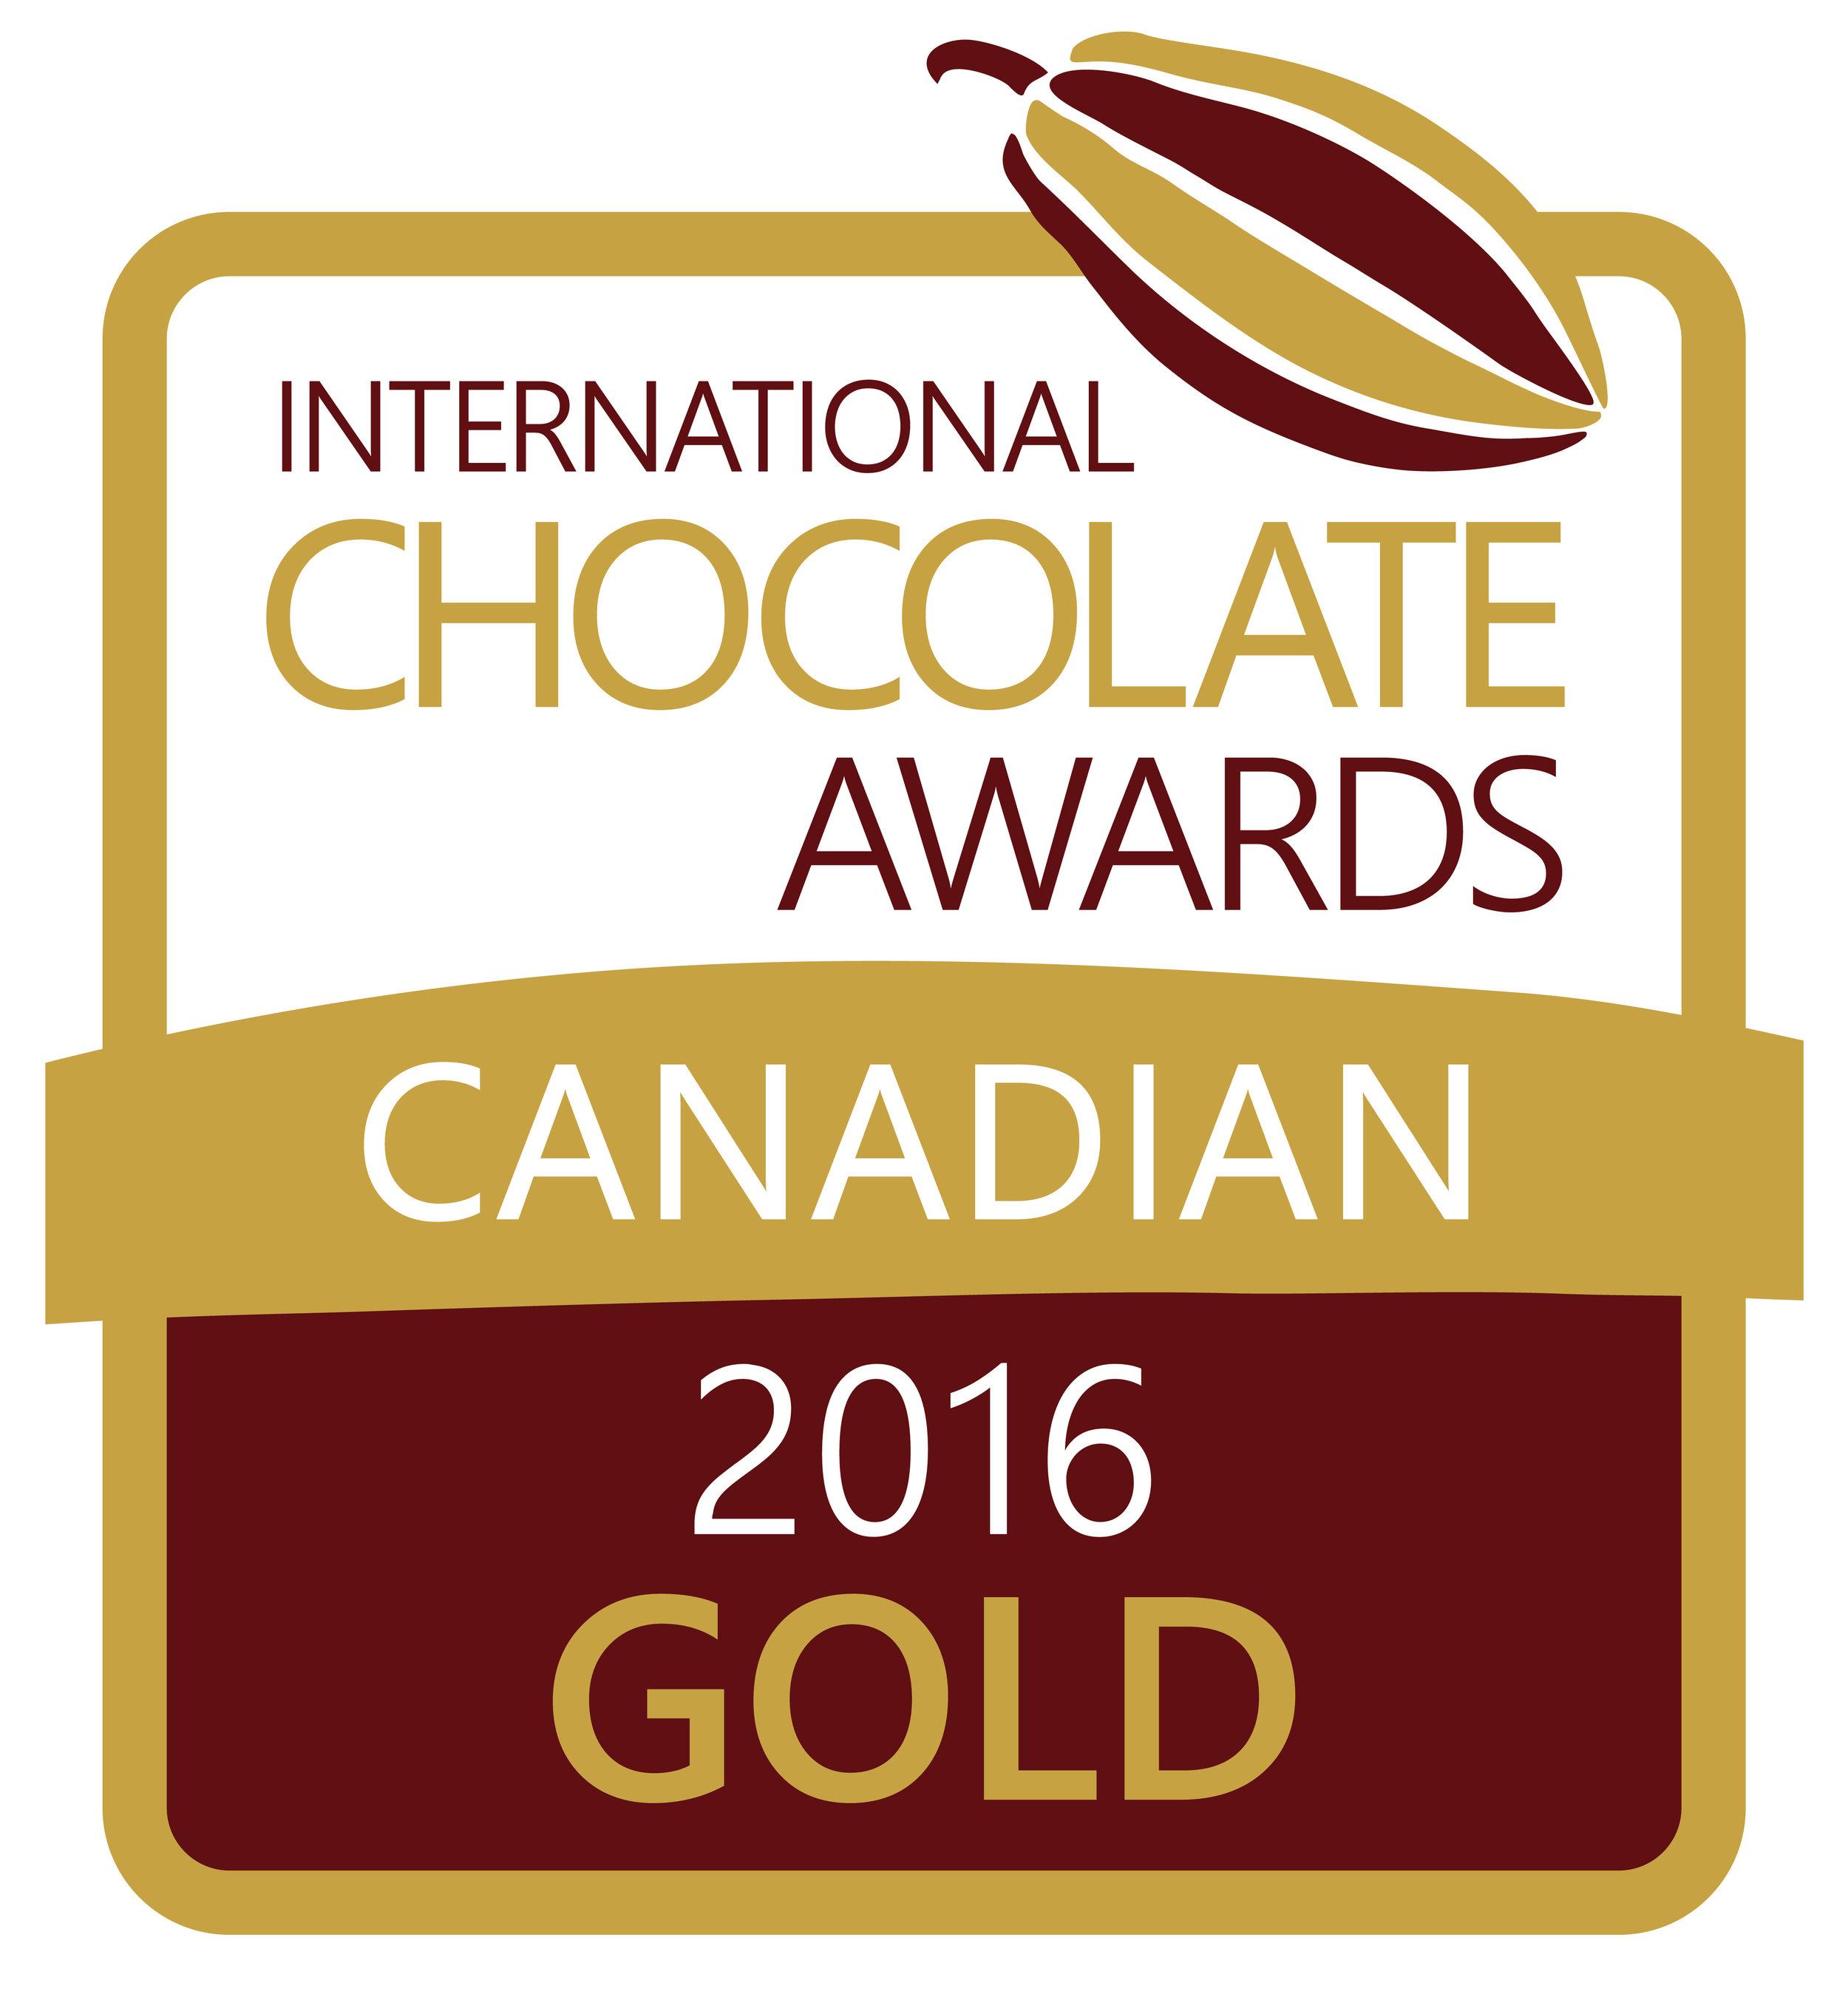 ica-prize-logo-2016-gold-canadian-rgb.jpg